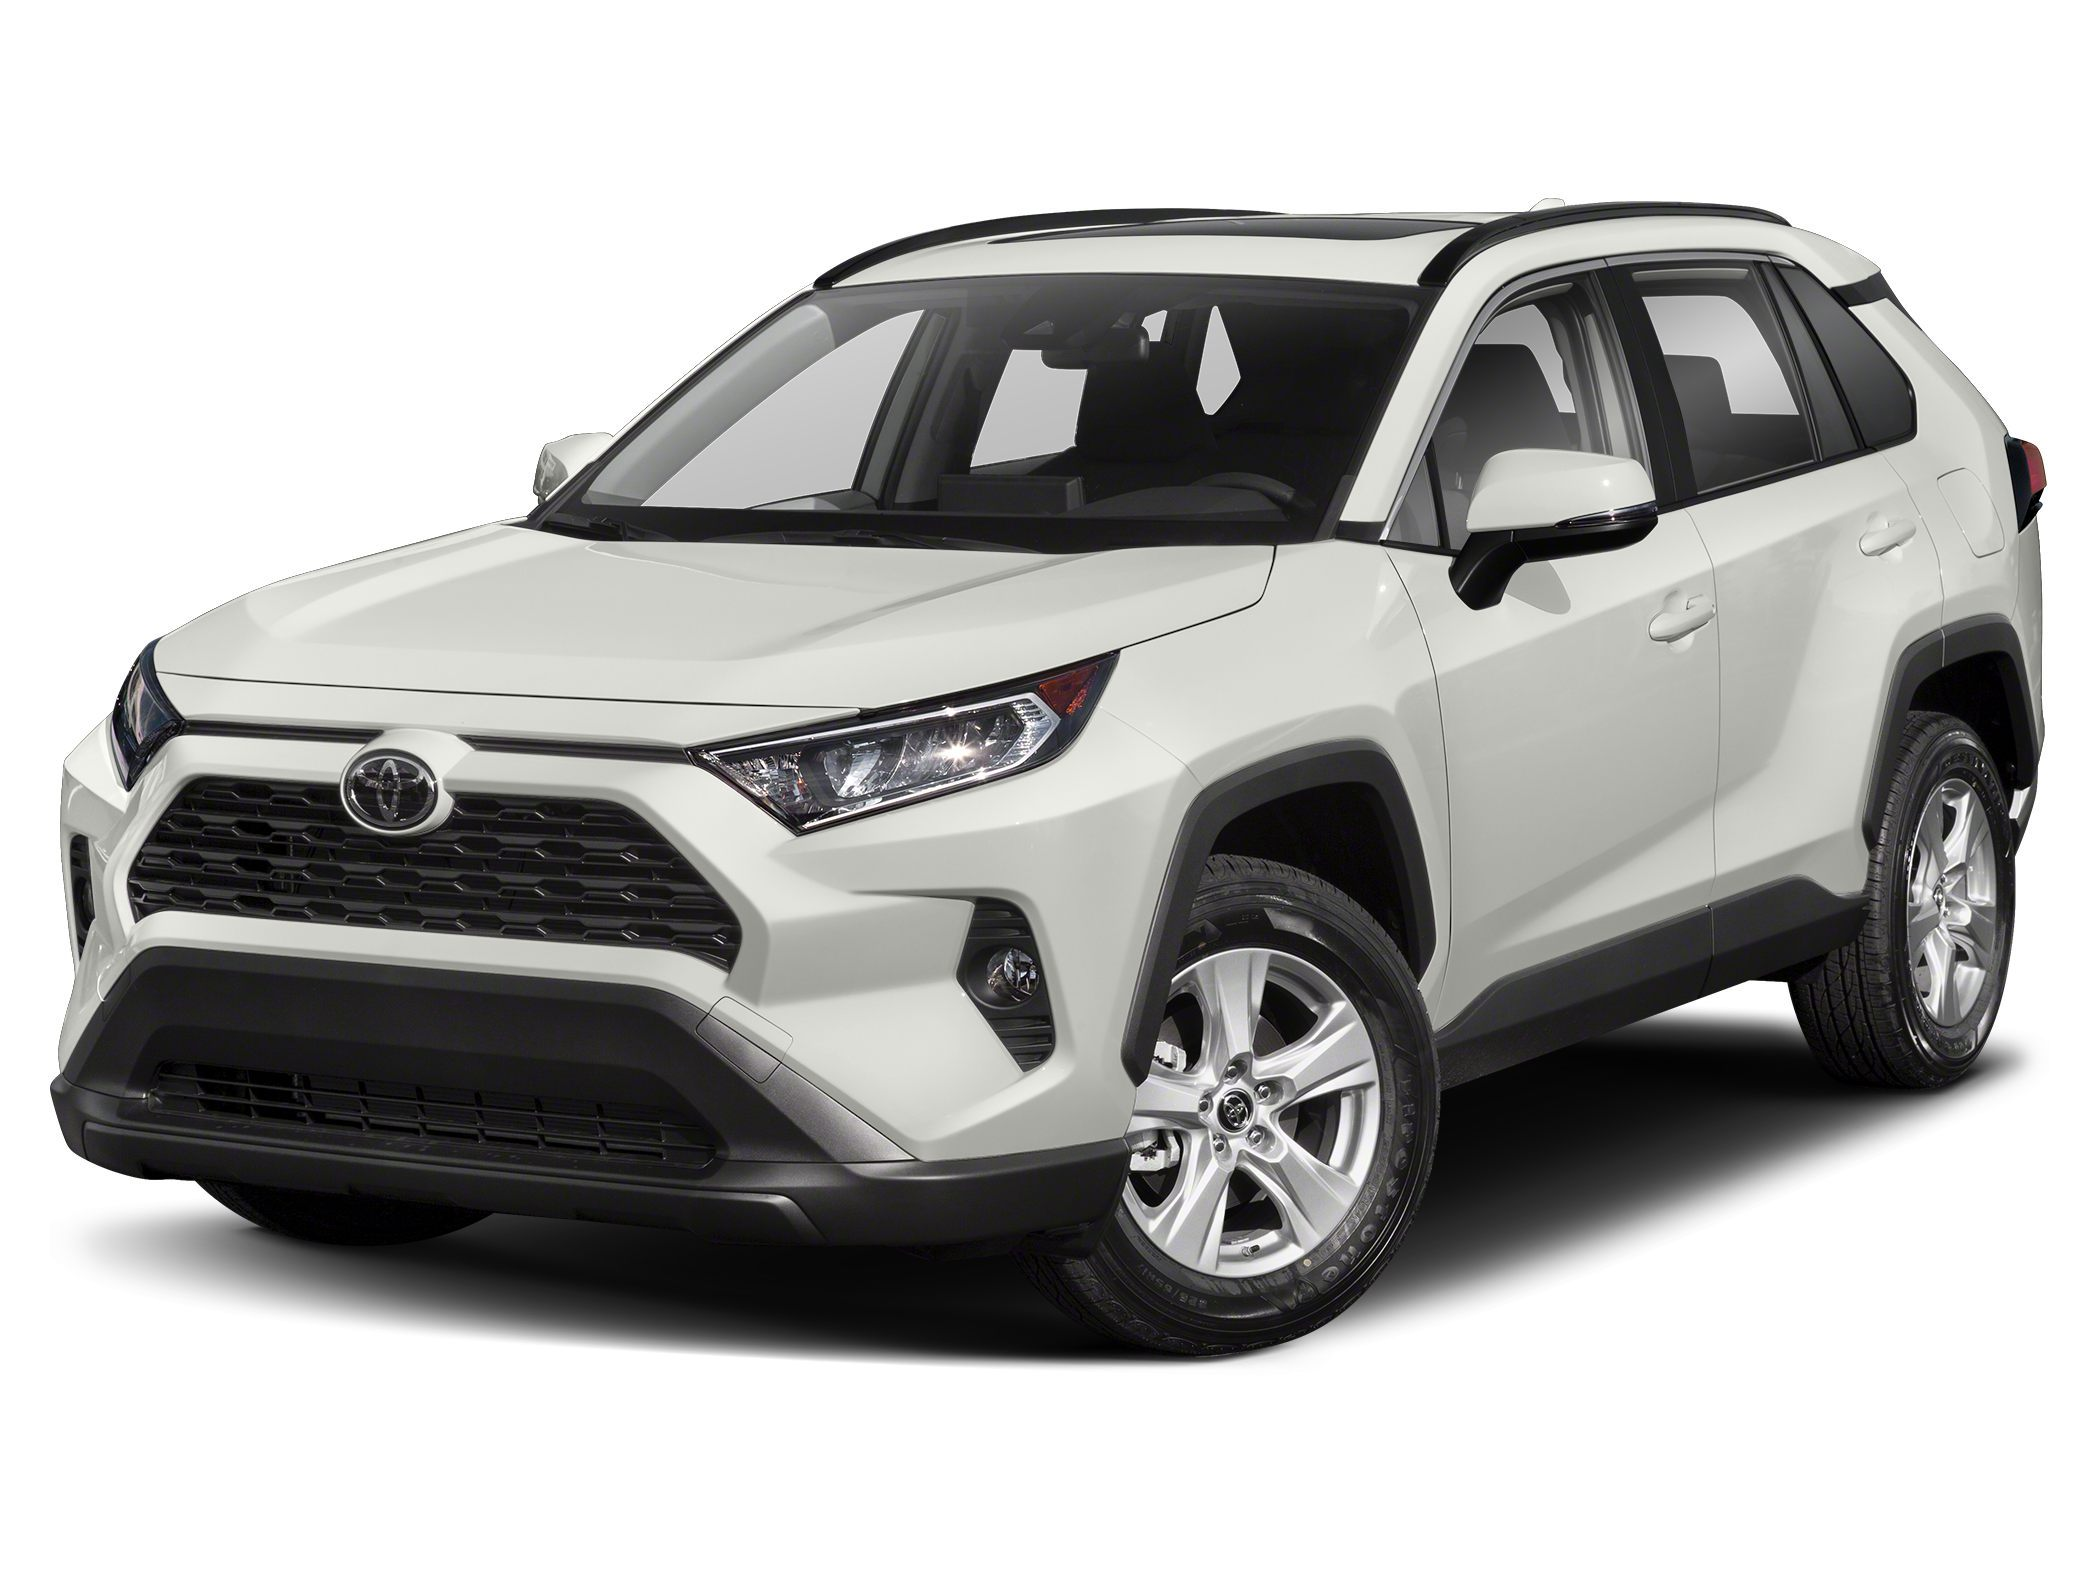 New 2021 Toyota Rav4 For Sale At Prestige Toyota Of Ramsey Vin 2t3a1rfv6mw188016